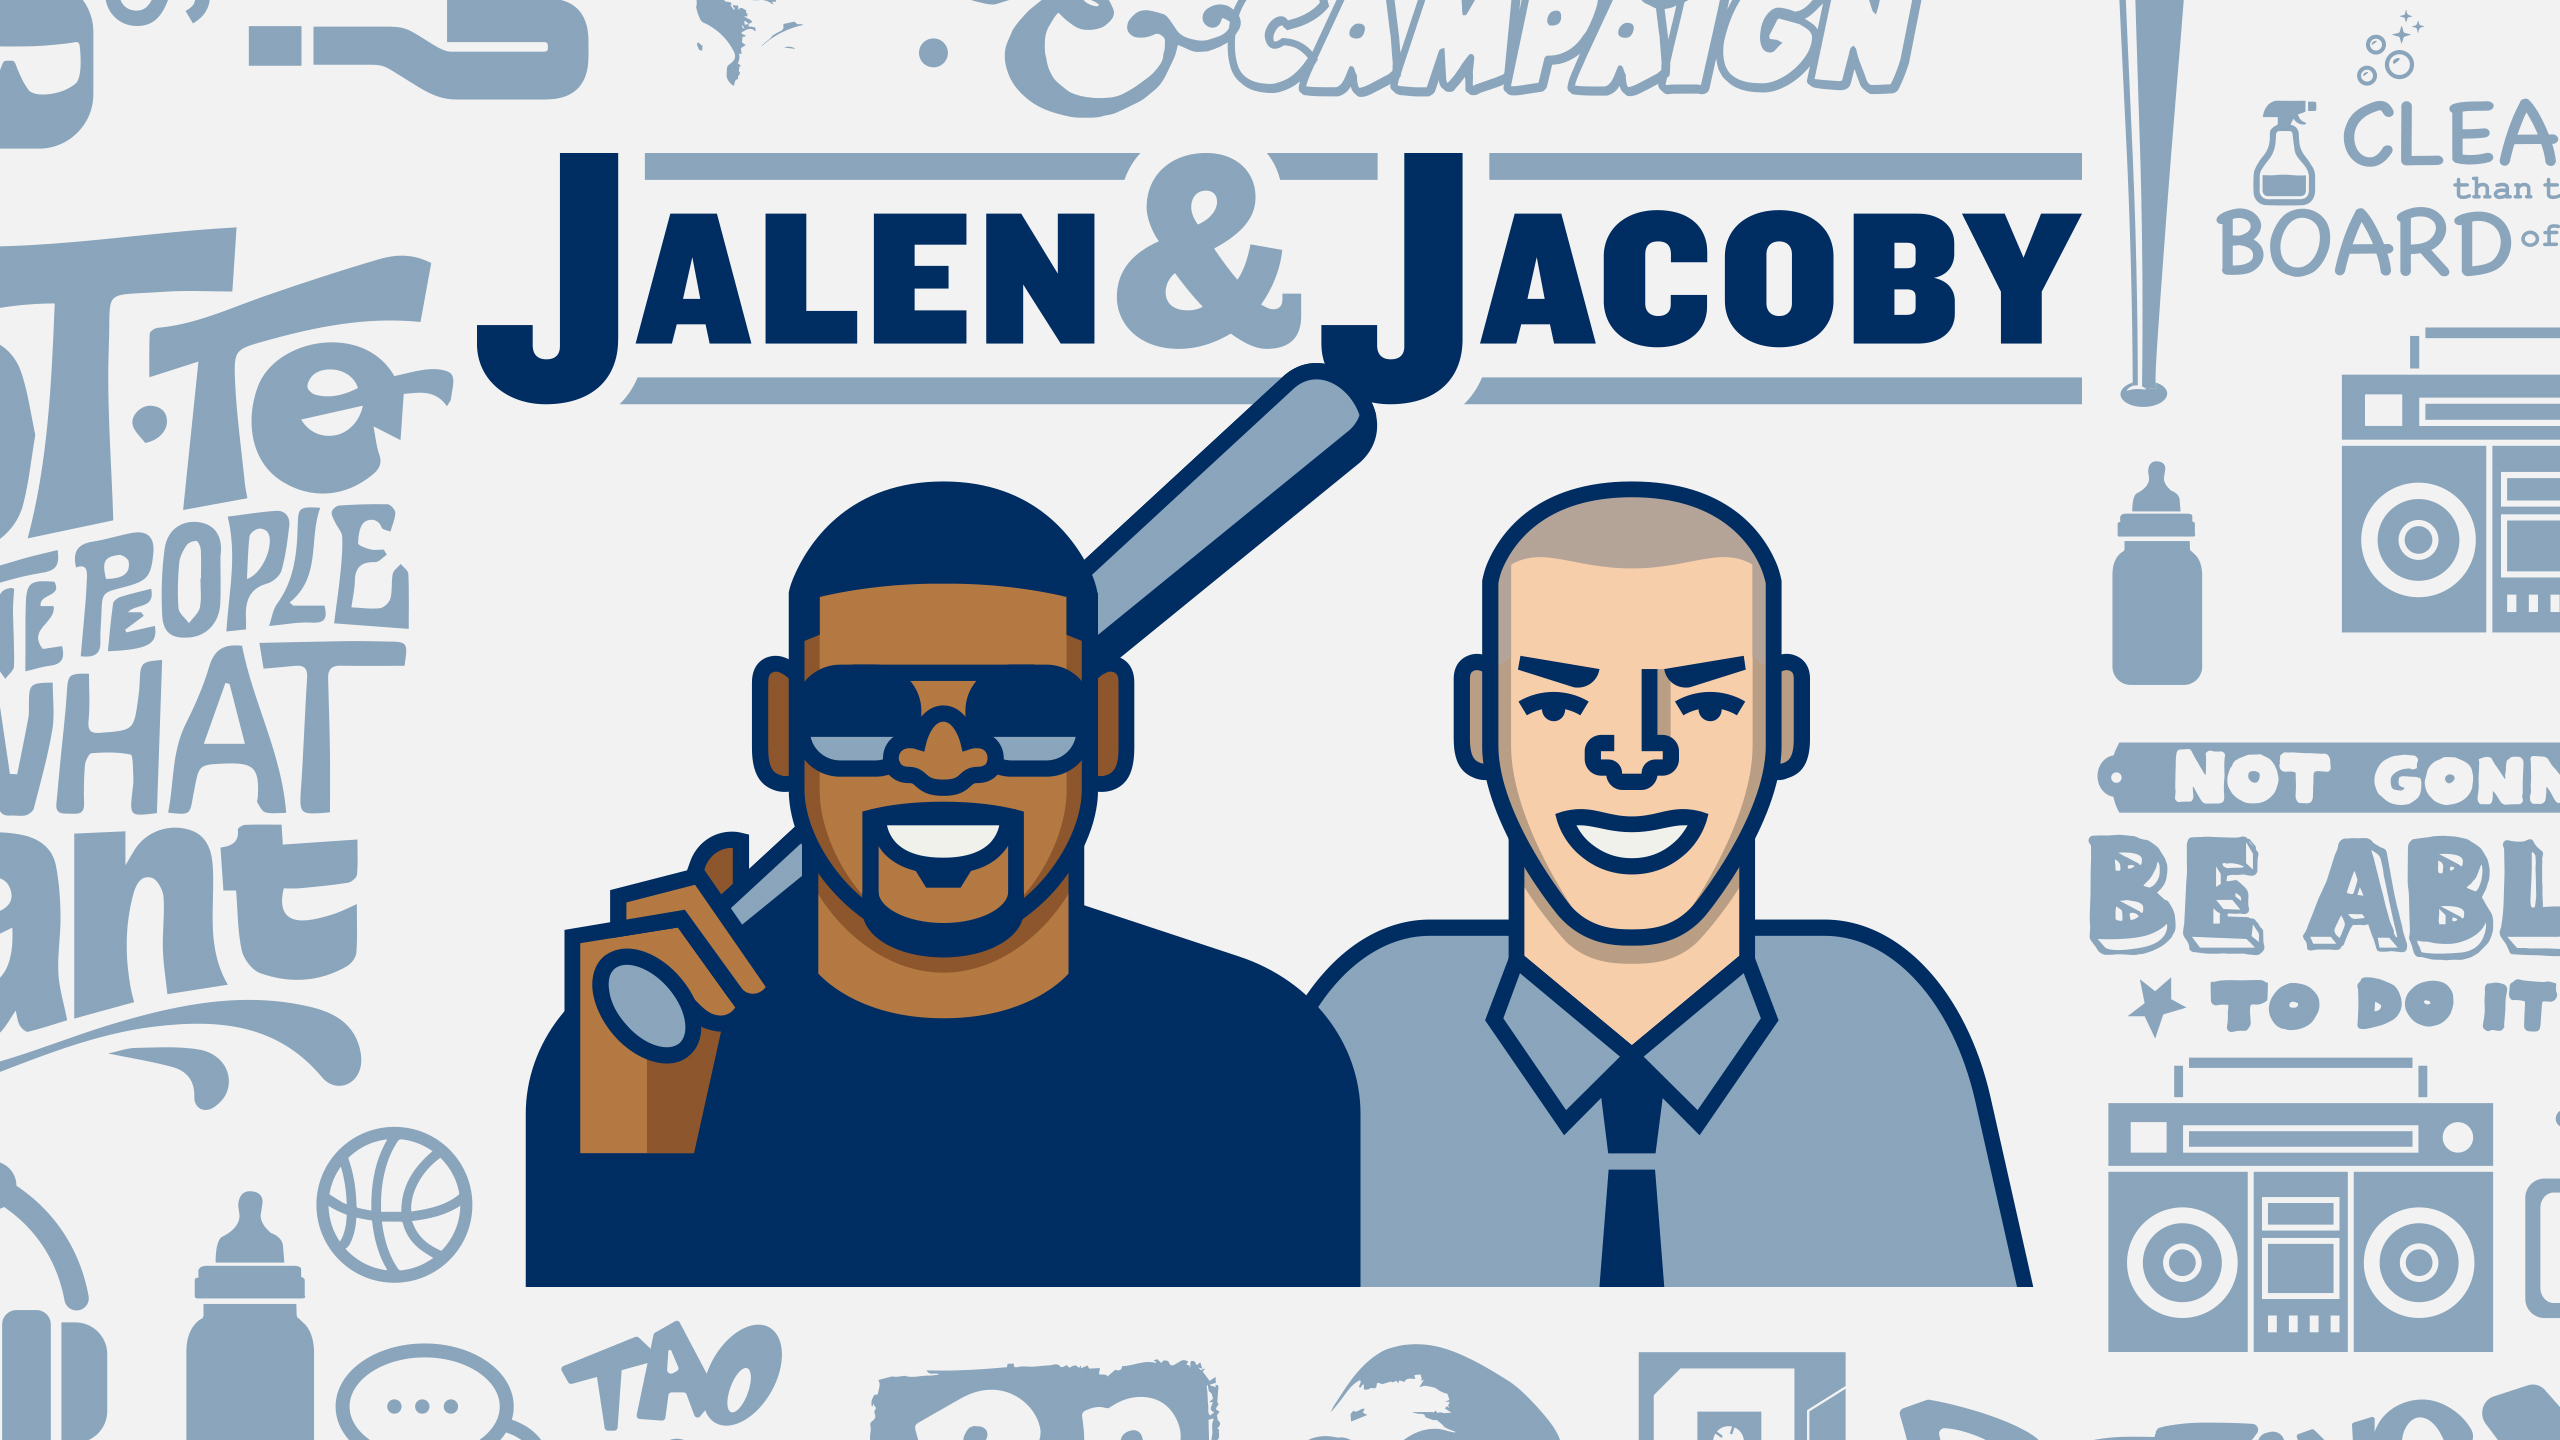 Mon, 9/24 - Jalen & Jacoby